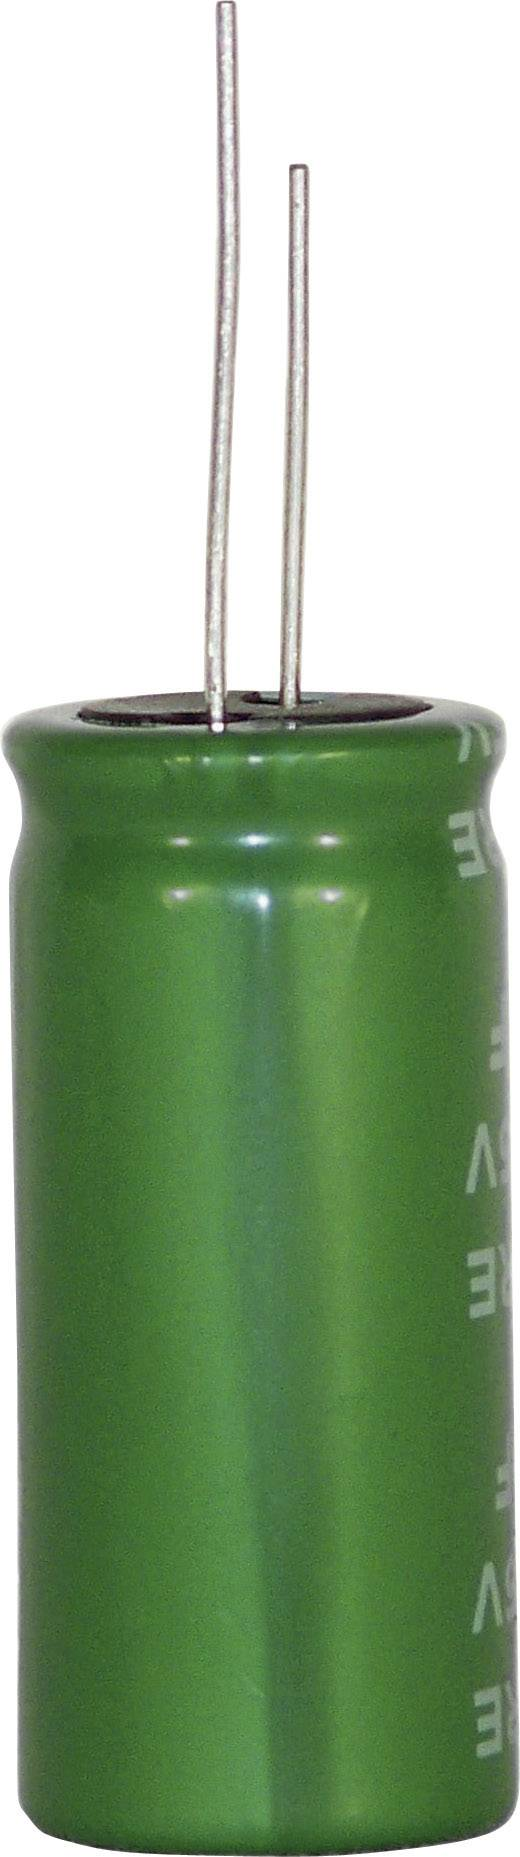 Kondenzátor elektrolytický 2vrstvý DRE105S0EF12RRDAP, 1 F, 2,5 V, 20 %, 12 x 8 mm